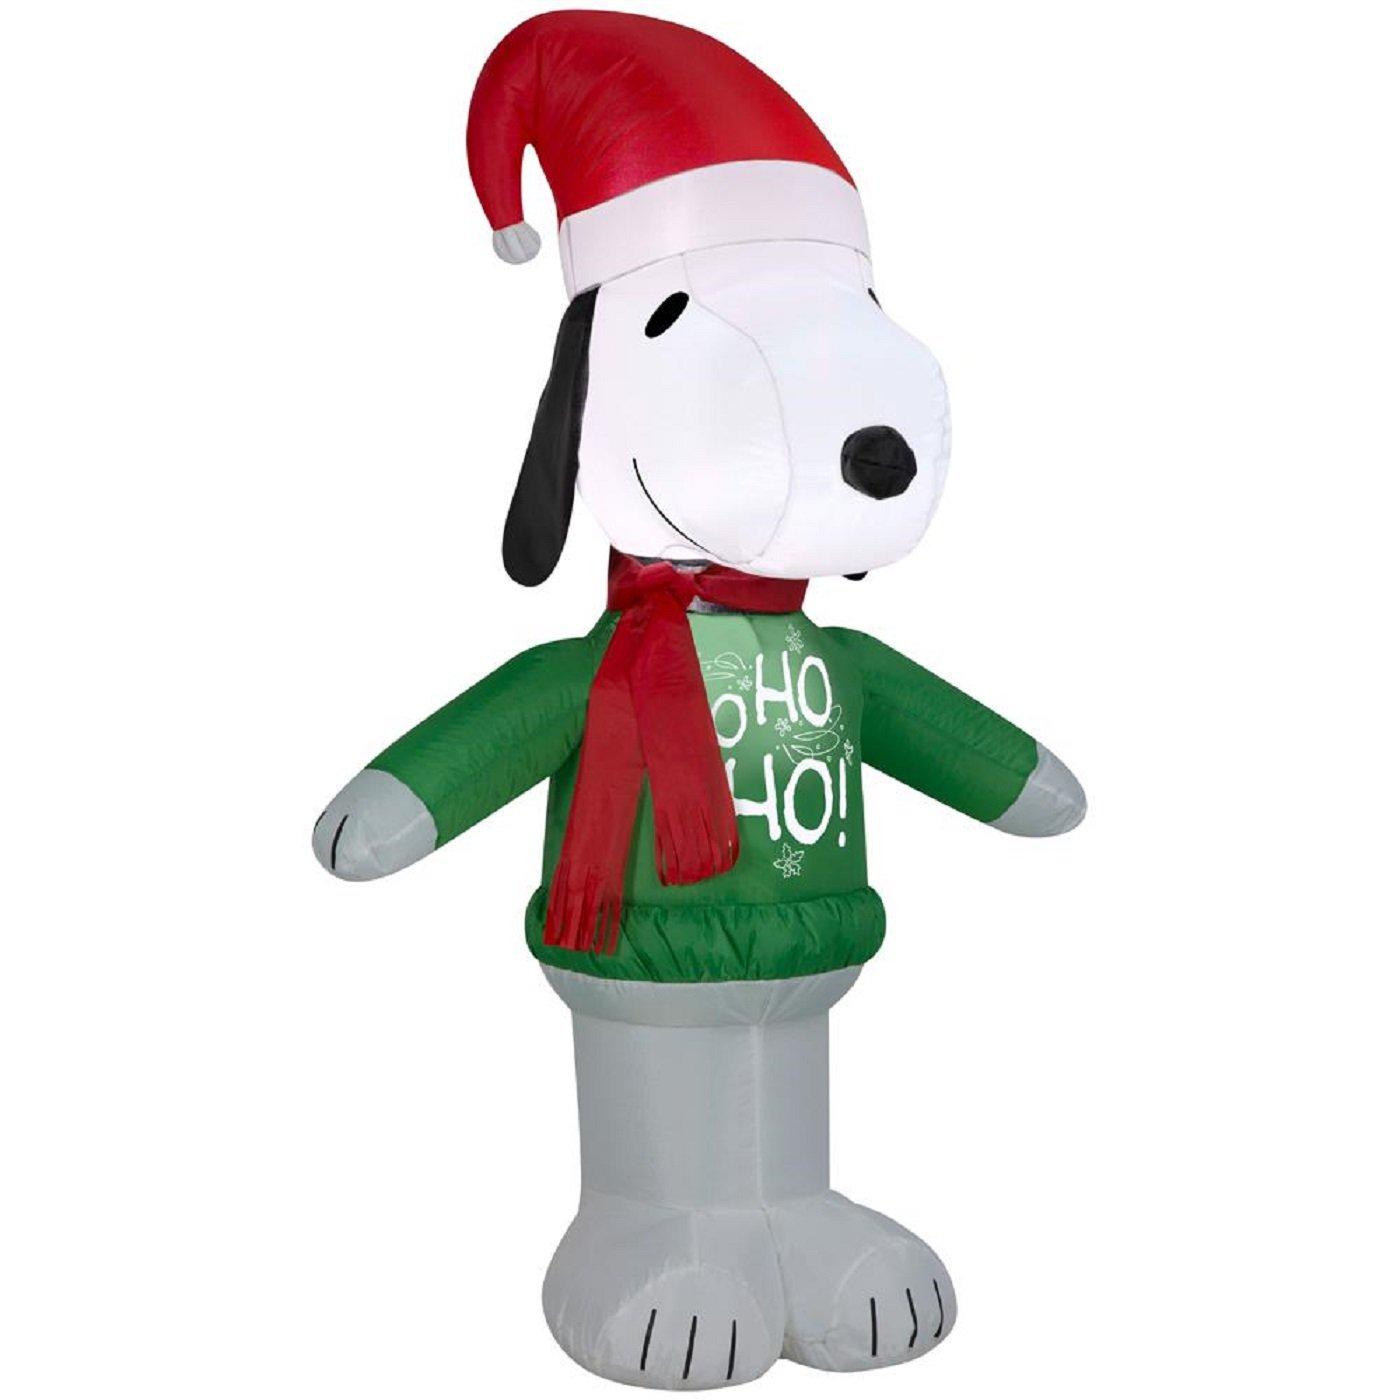 Amazon.com : Gemmy 15375 Airblown Snoopy Ho Sweater Christmas ...